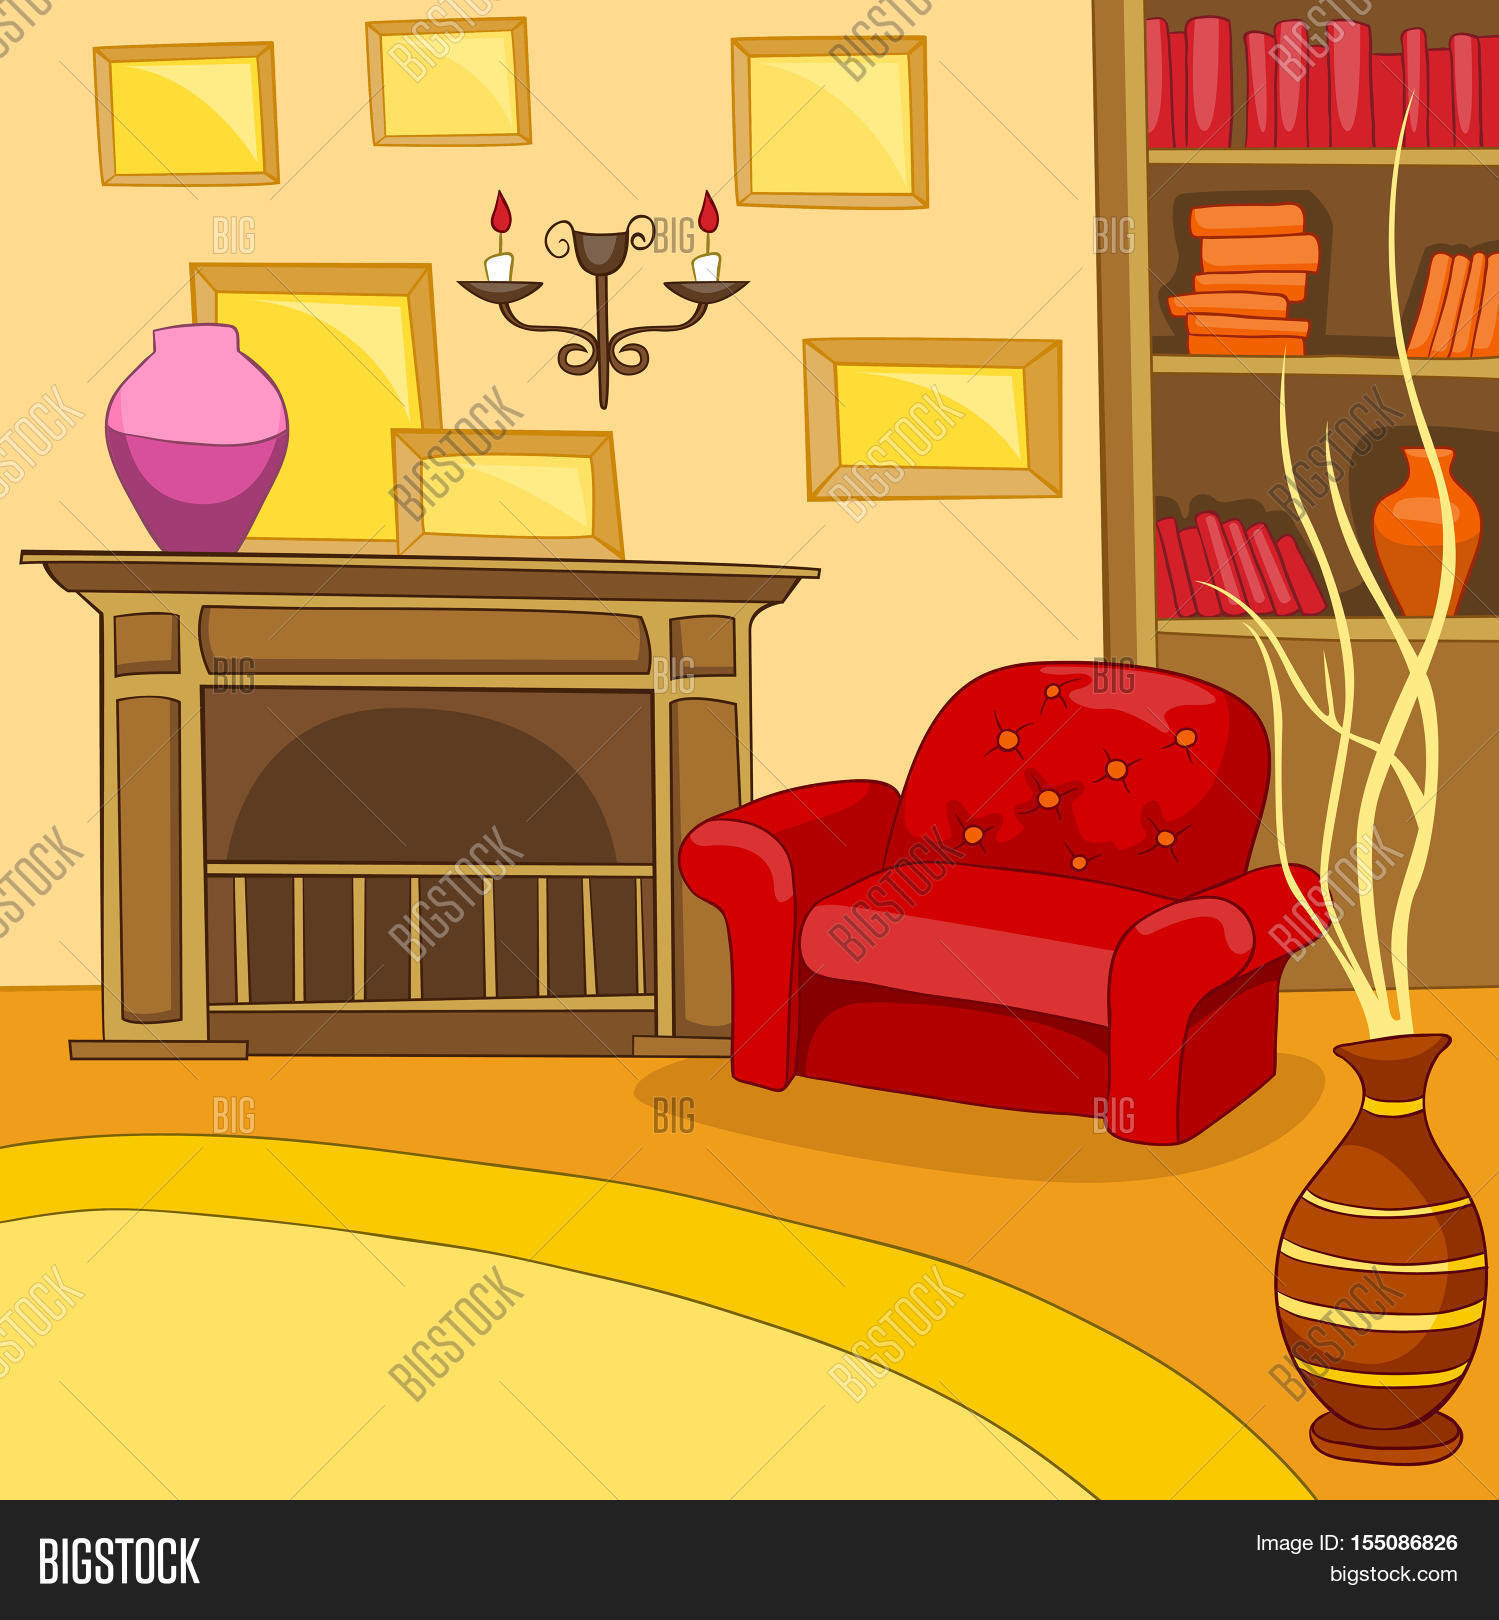 Hand Drawn Cartoon Living Room. Image